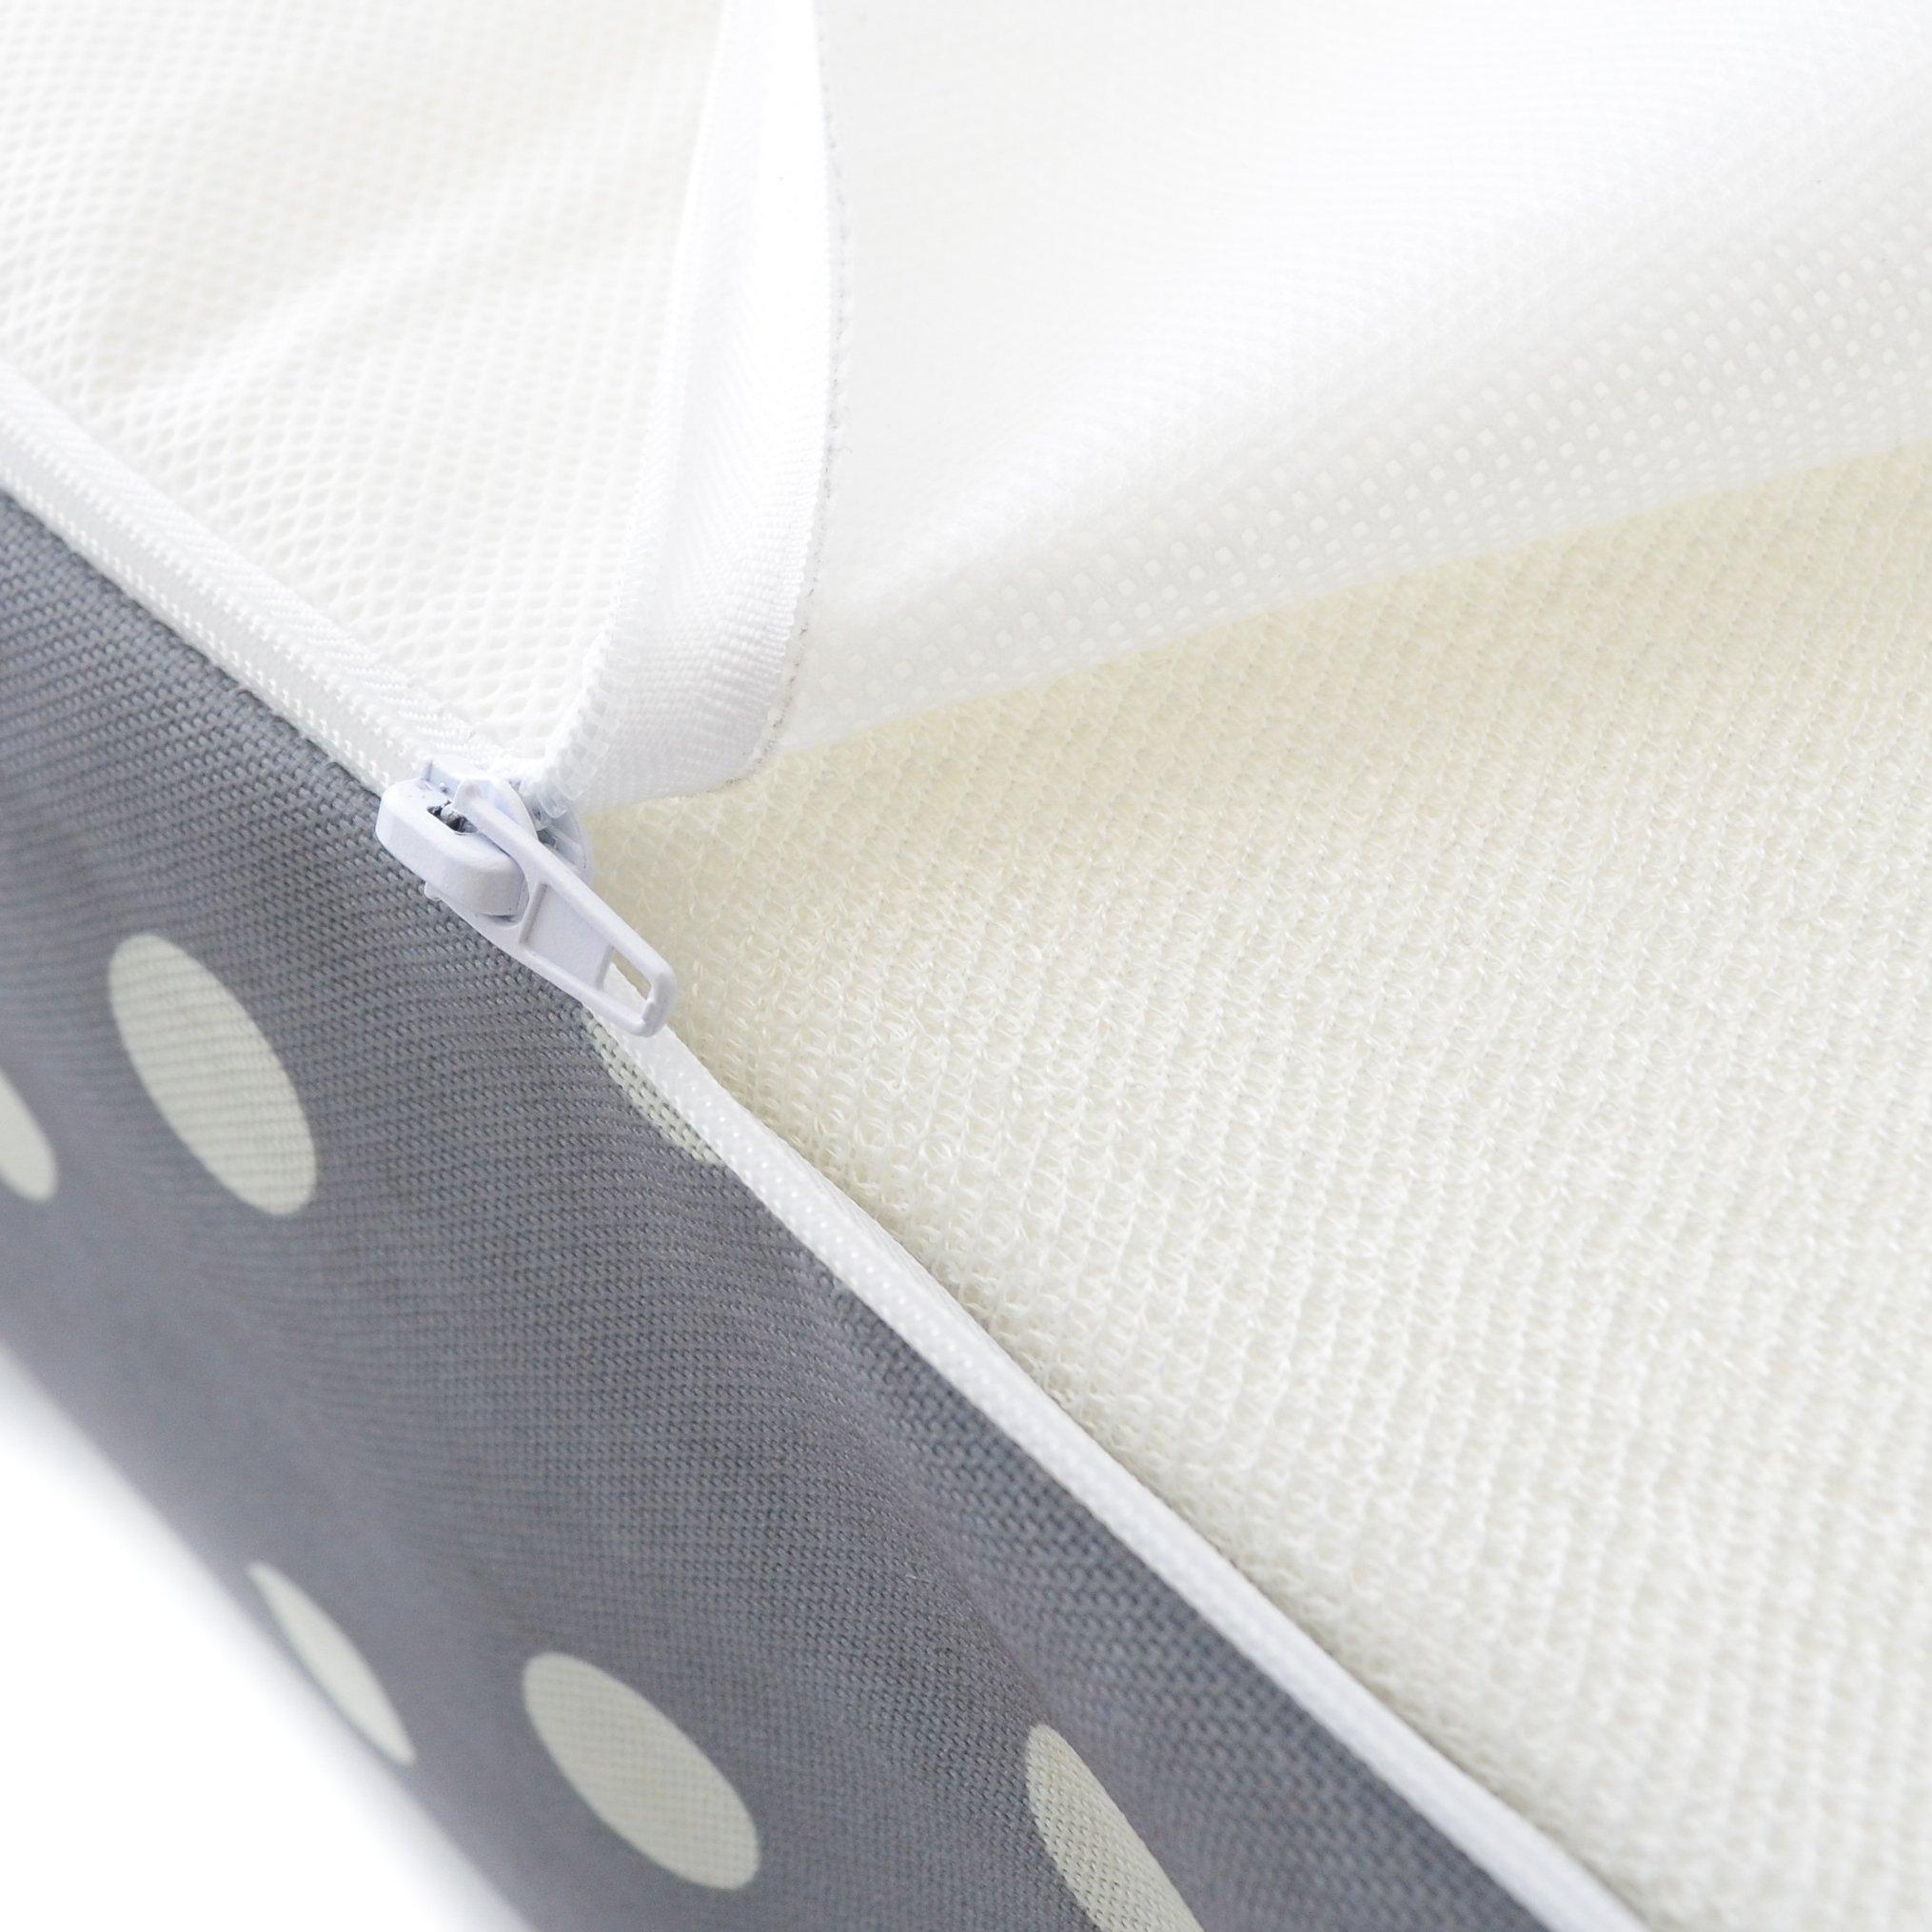 Milliard Crib Mattress and Toddler Bed Mattress | Hypoallergenic + Waterproof Encasement | 27.5''x52''x5'' by Milliard (Image #7)